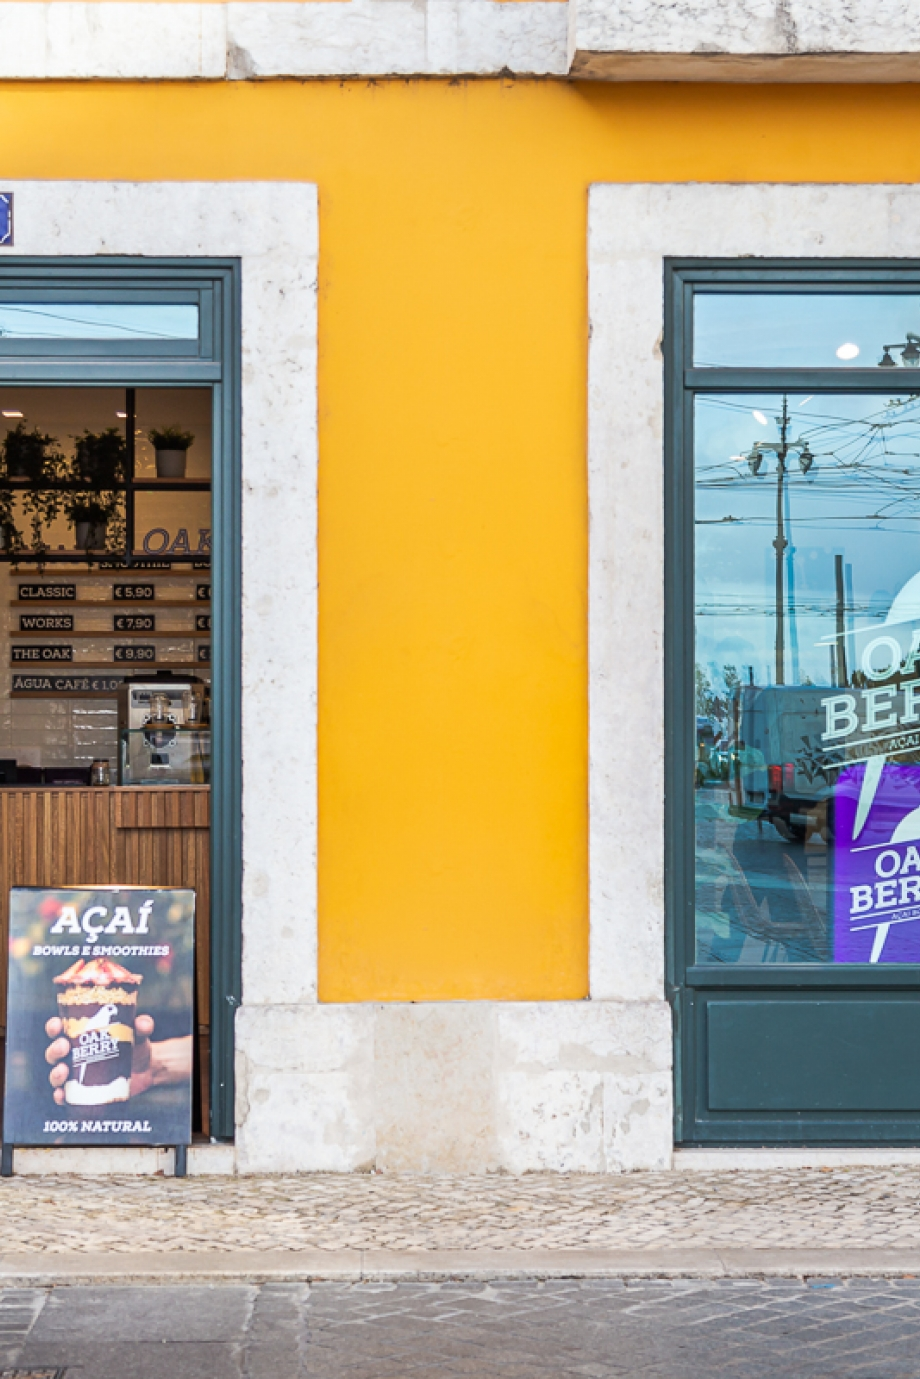 Lisboa Cool_Comer_Café_Oakberry Açaí